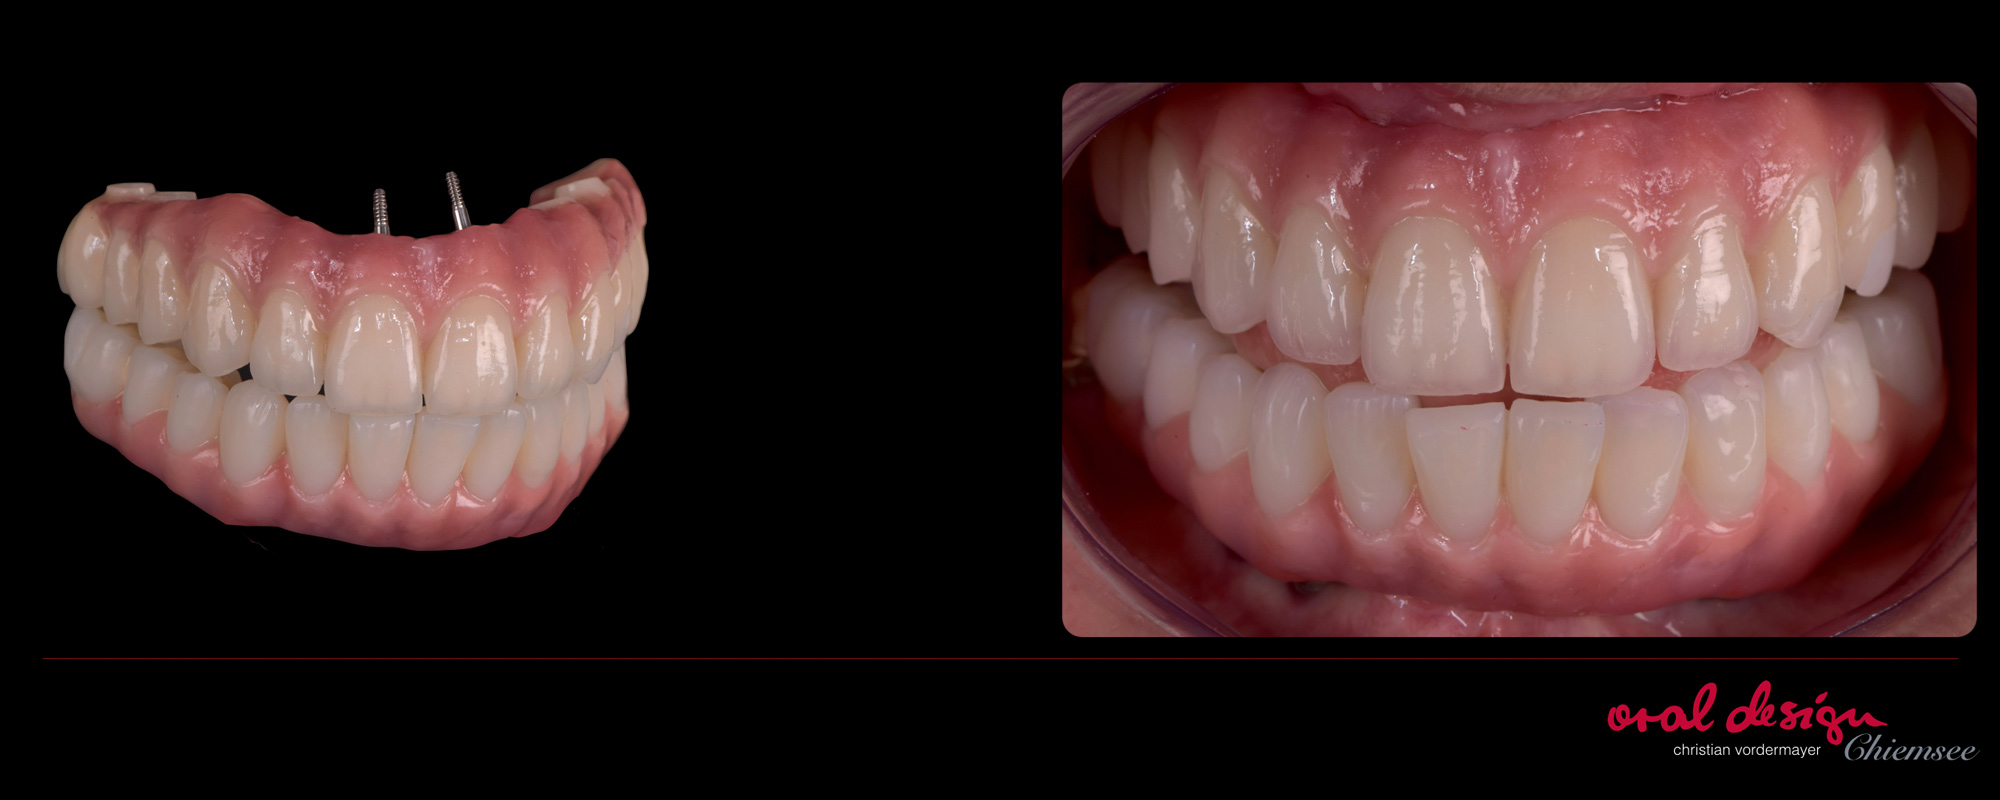 implantat-oraldesign-chiemsee-1.jpg